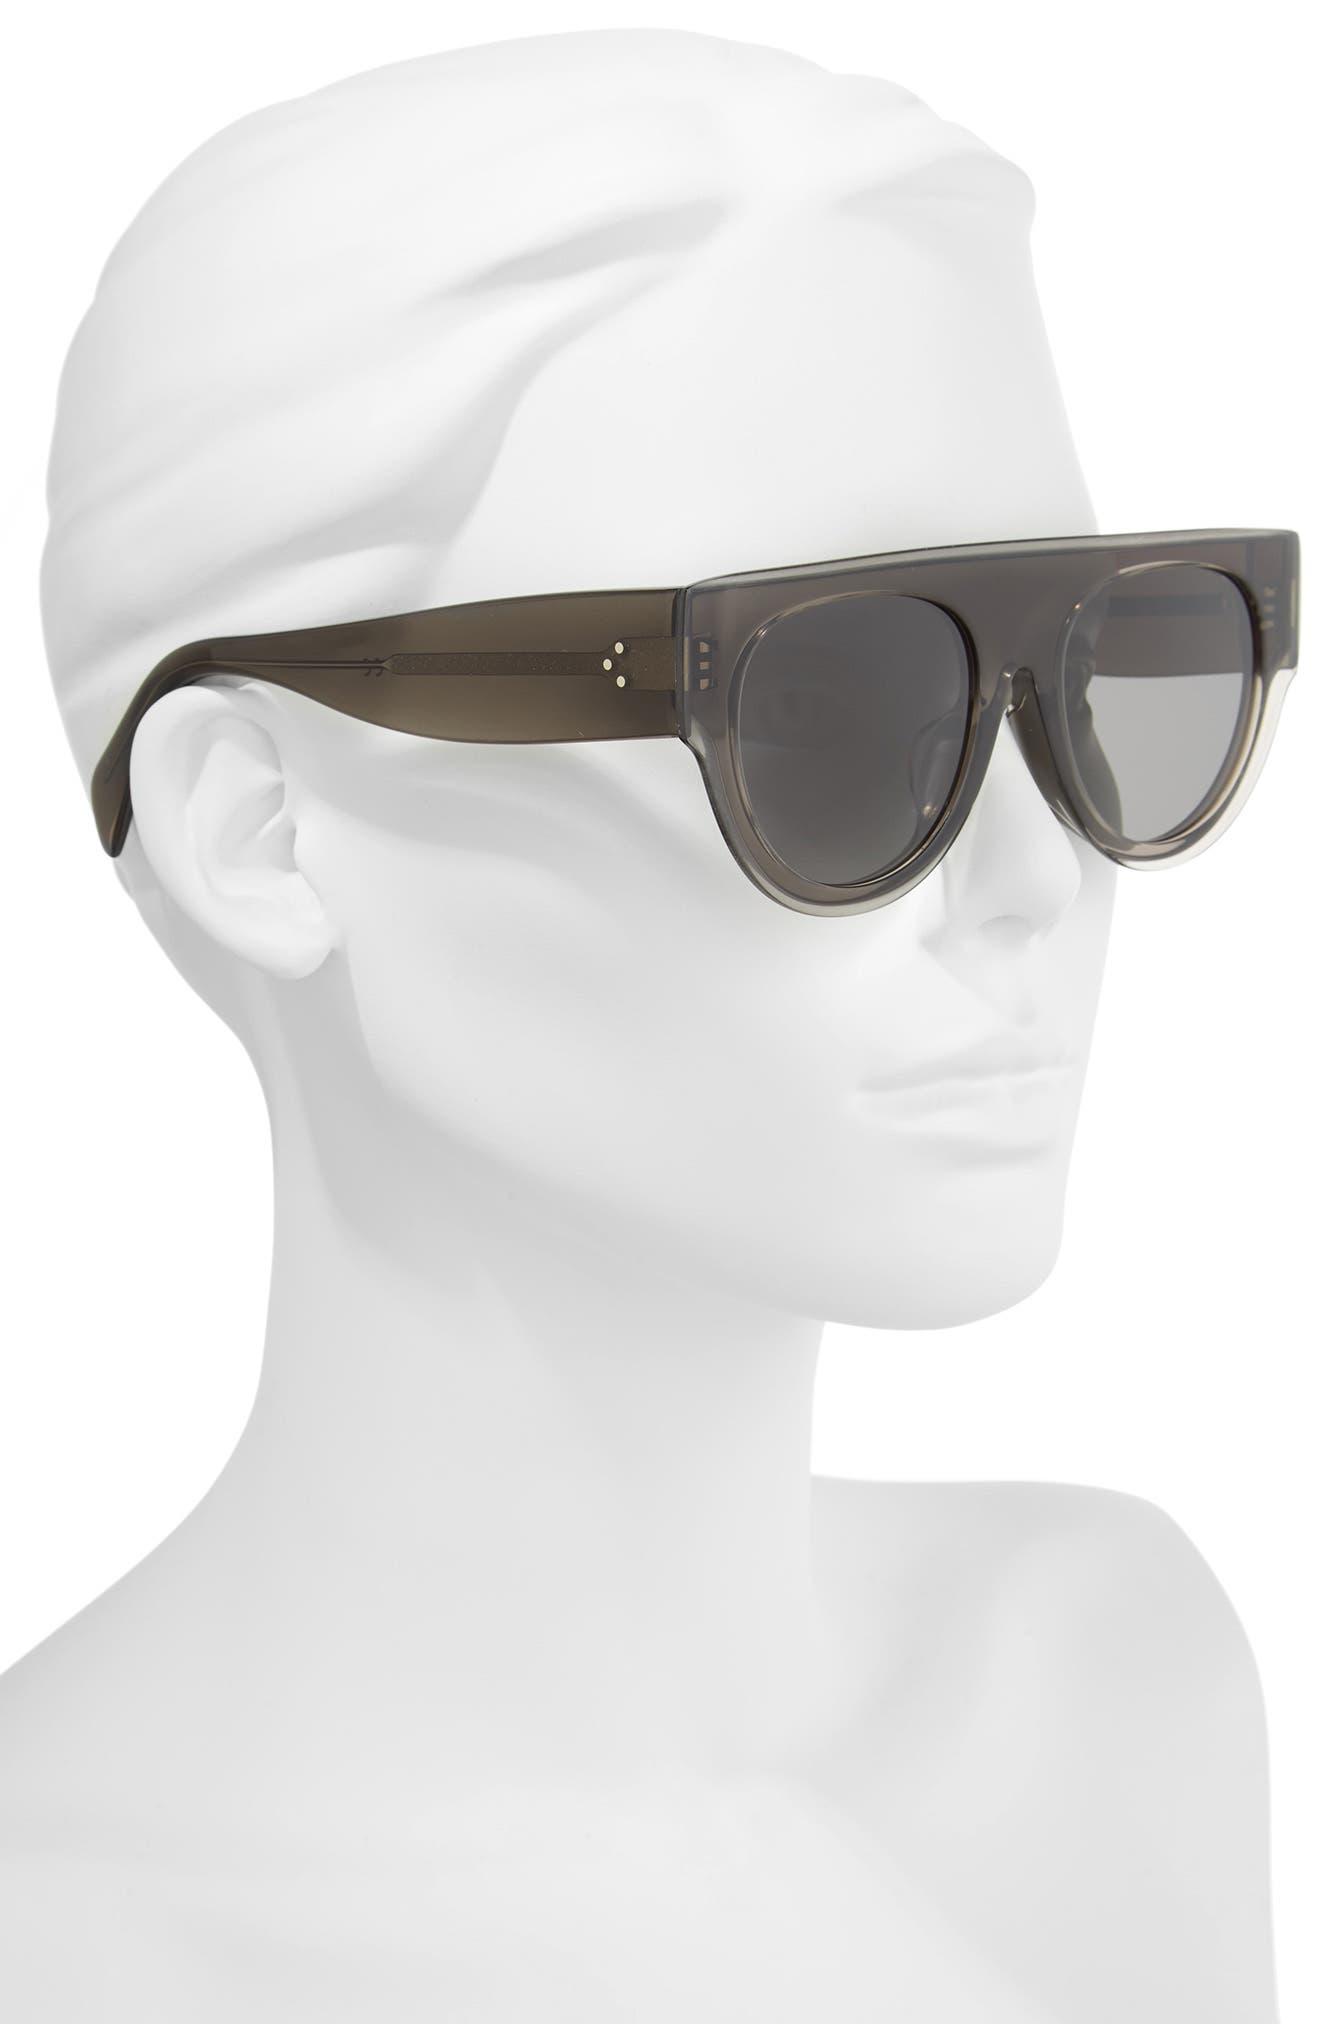 52mm Pilot Sunglasses,                             Alternate thumbnail 2, color,                             DARK GREY/ SMOKE